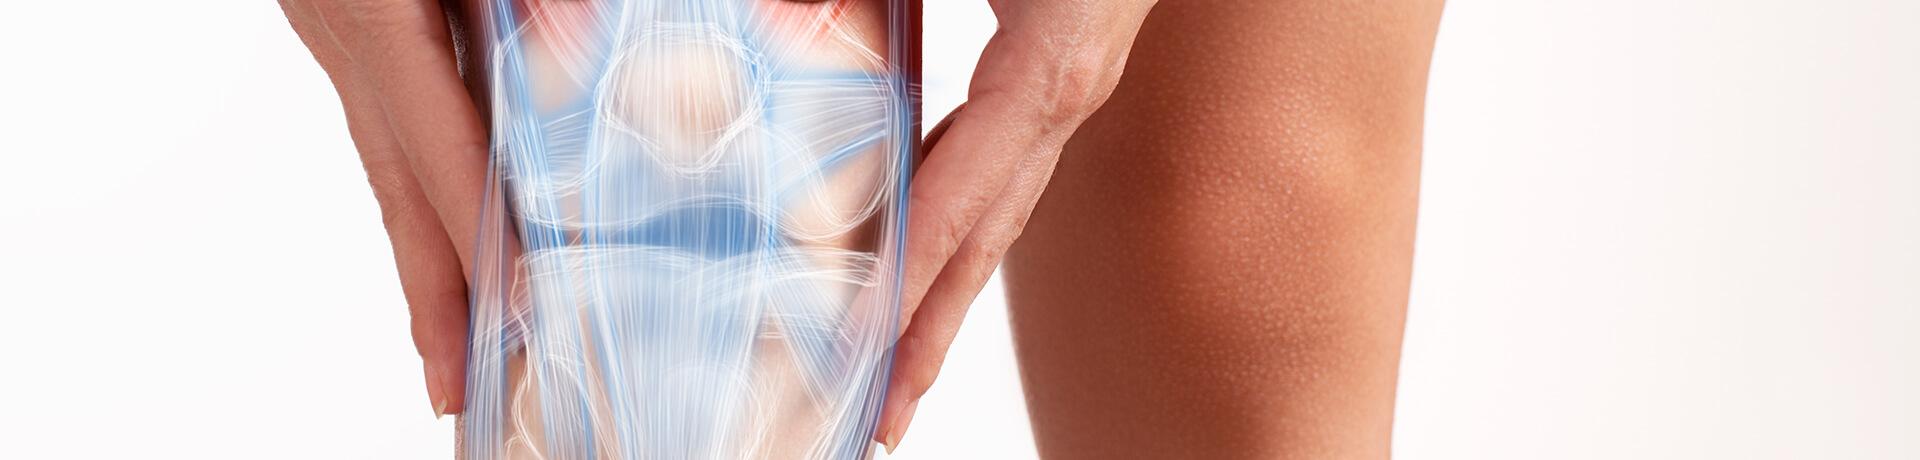 Knorpelzelltransplantation